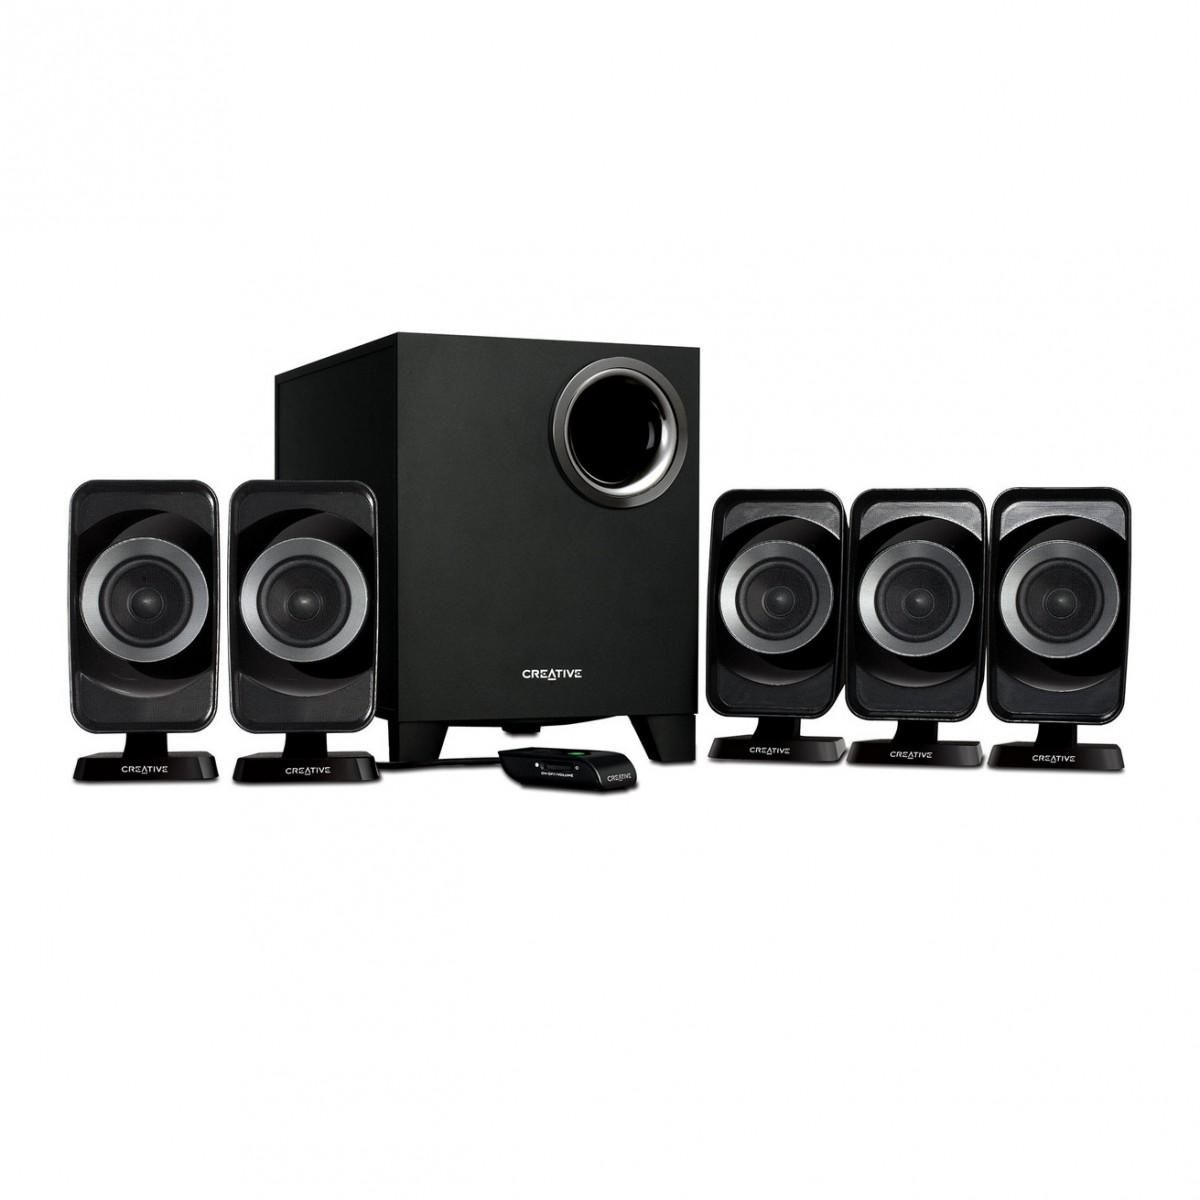 Creative INSPIRE T6160 5.1 Speaker System